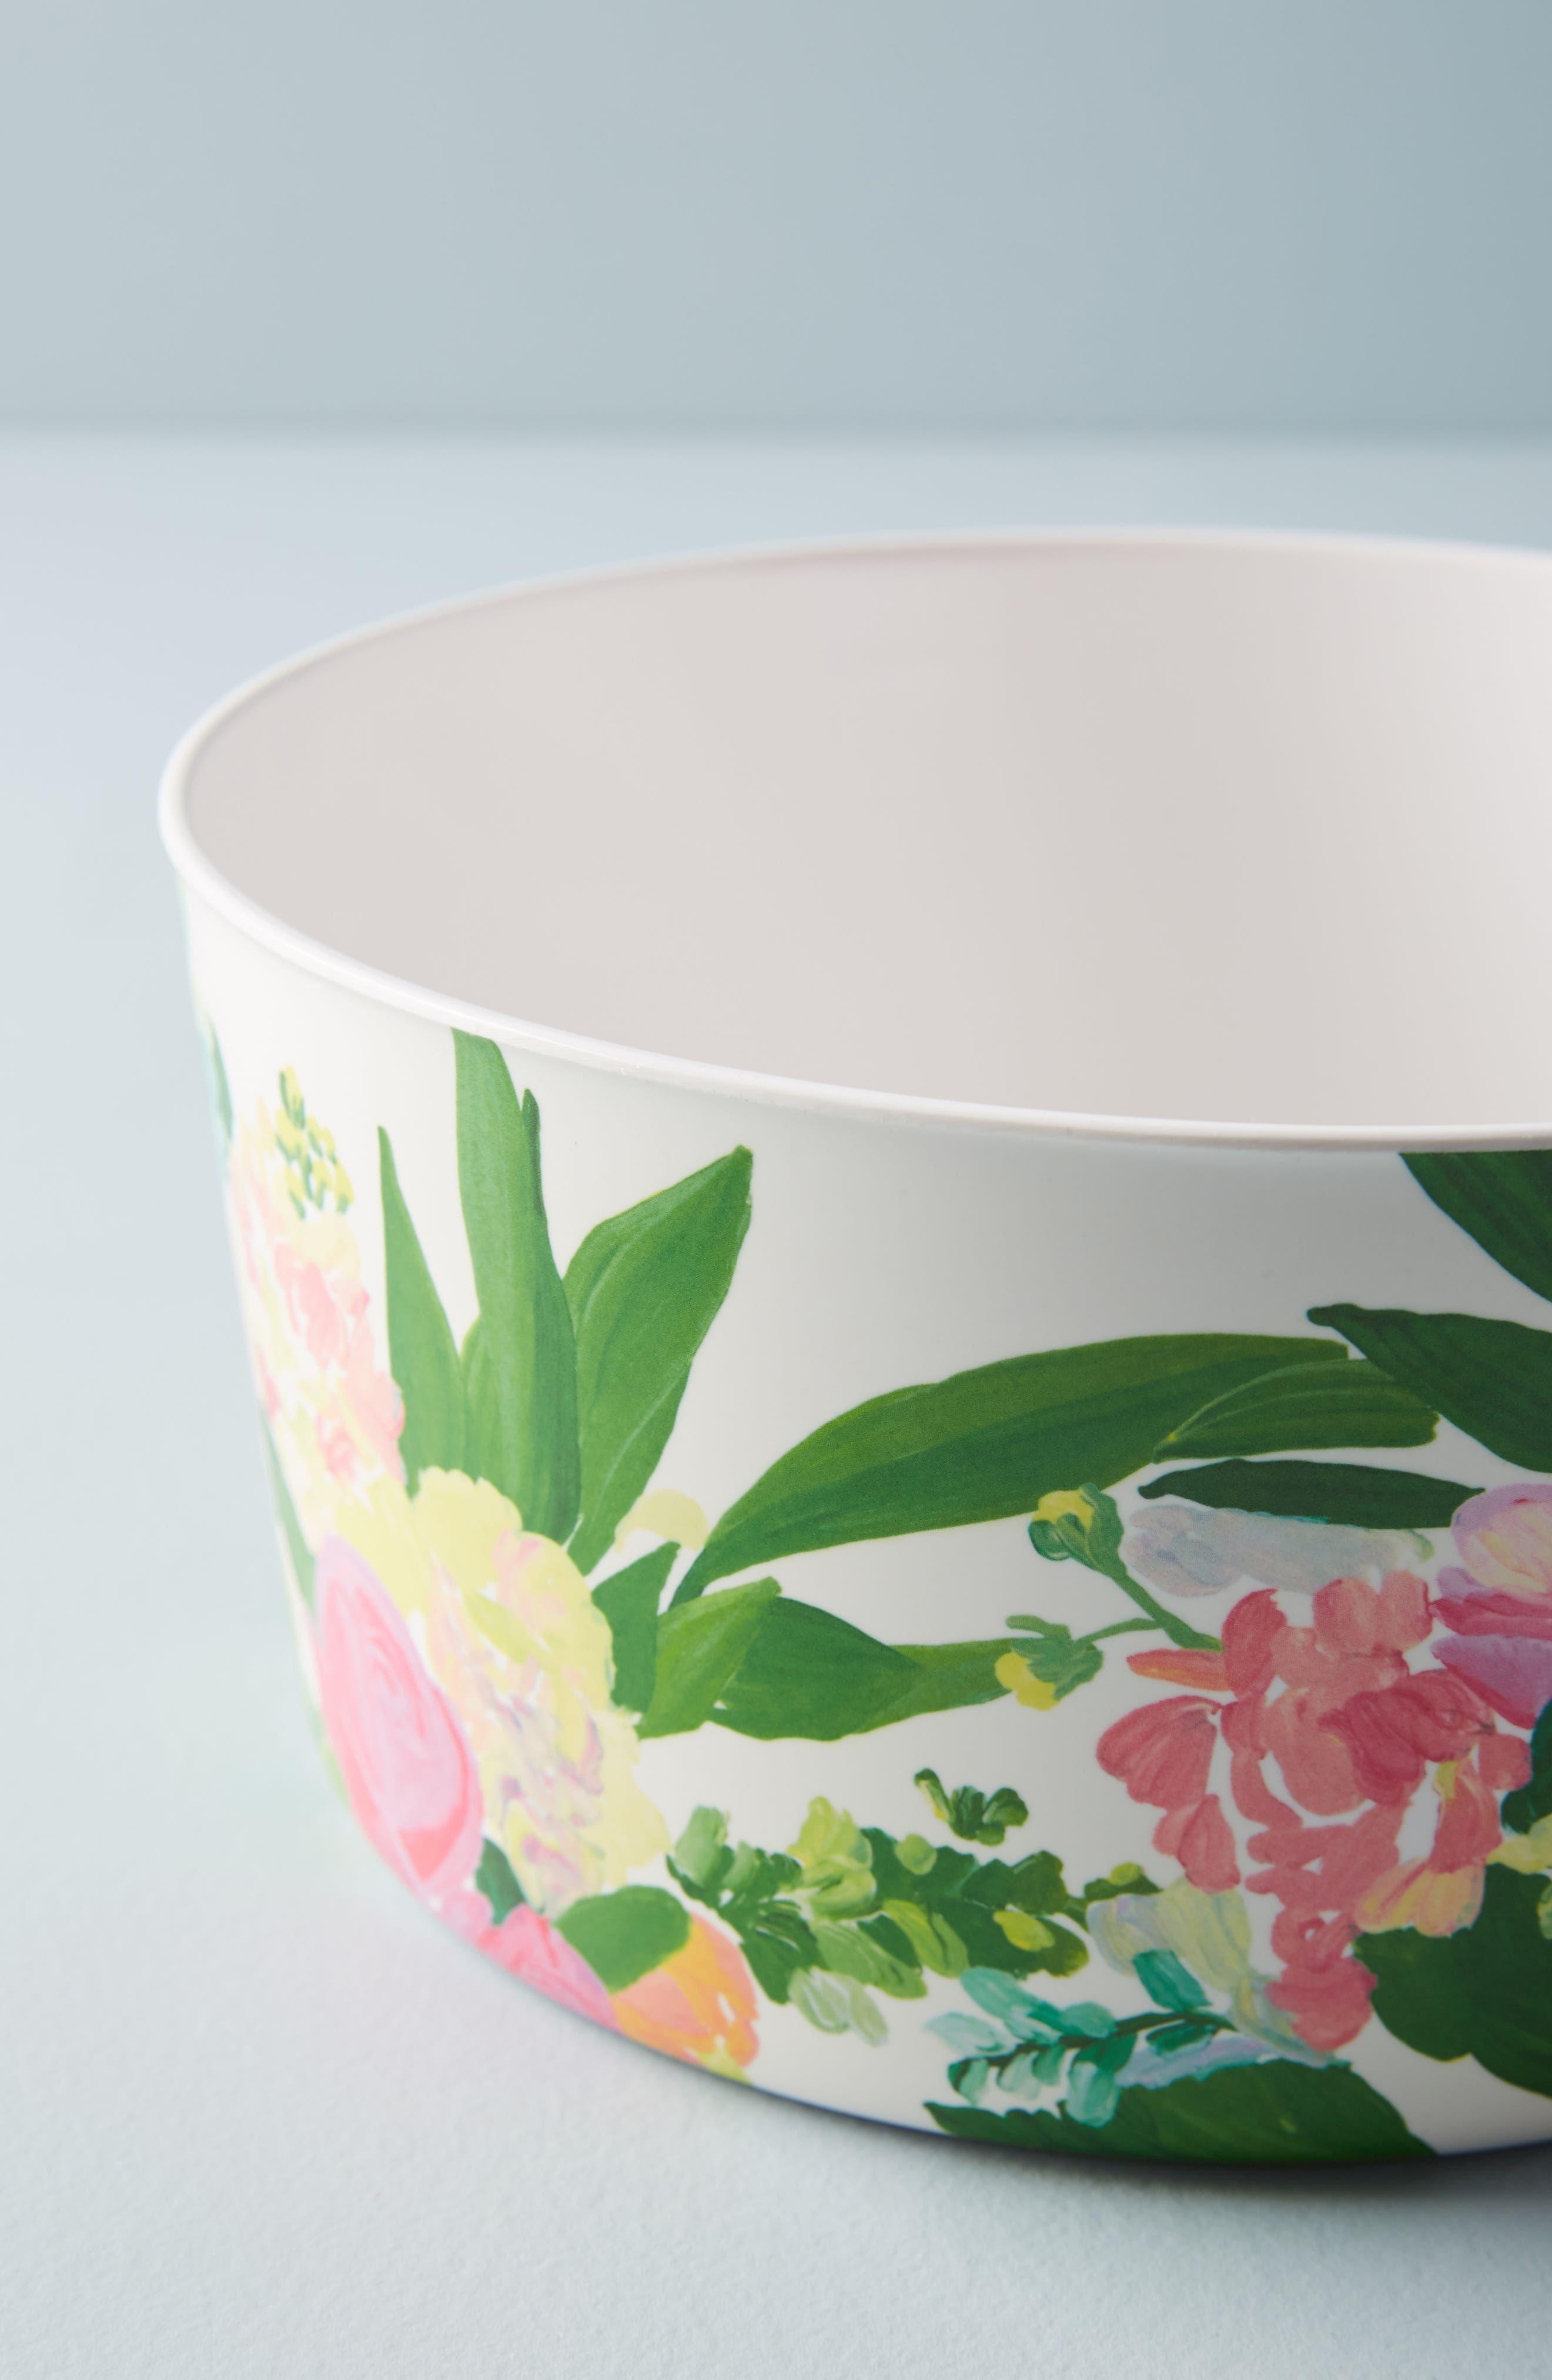 Paint + Petals Melamine Storage Bowl,                             Alternate thumbnail 2, color,                             White Multi